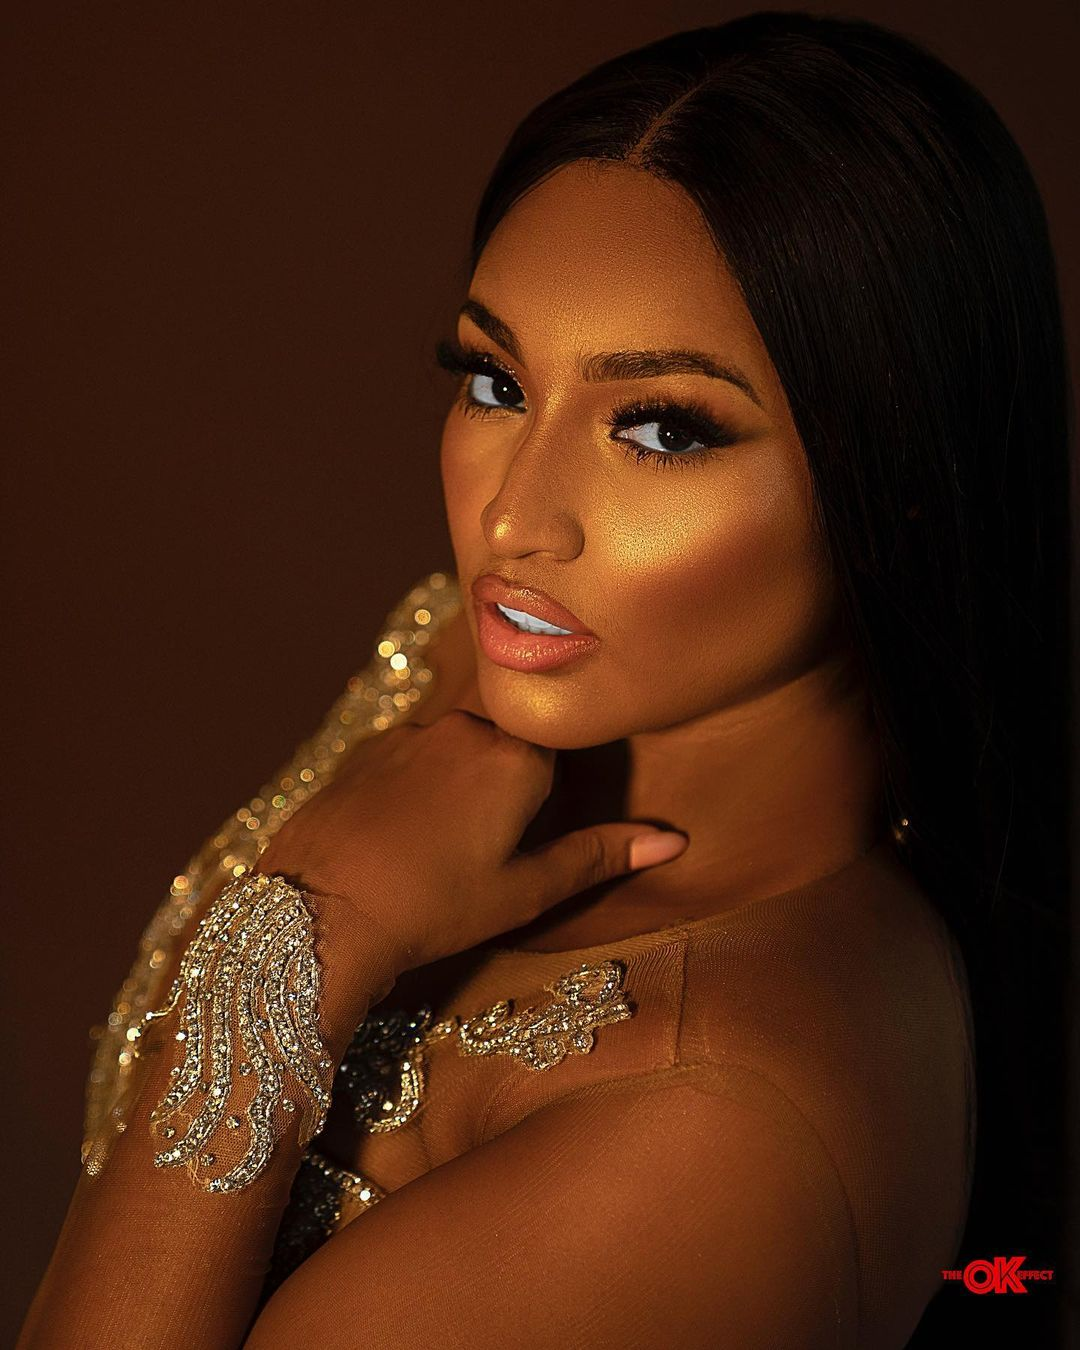 Beauty Is Not About Aesthetics - Nashaira Belisa